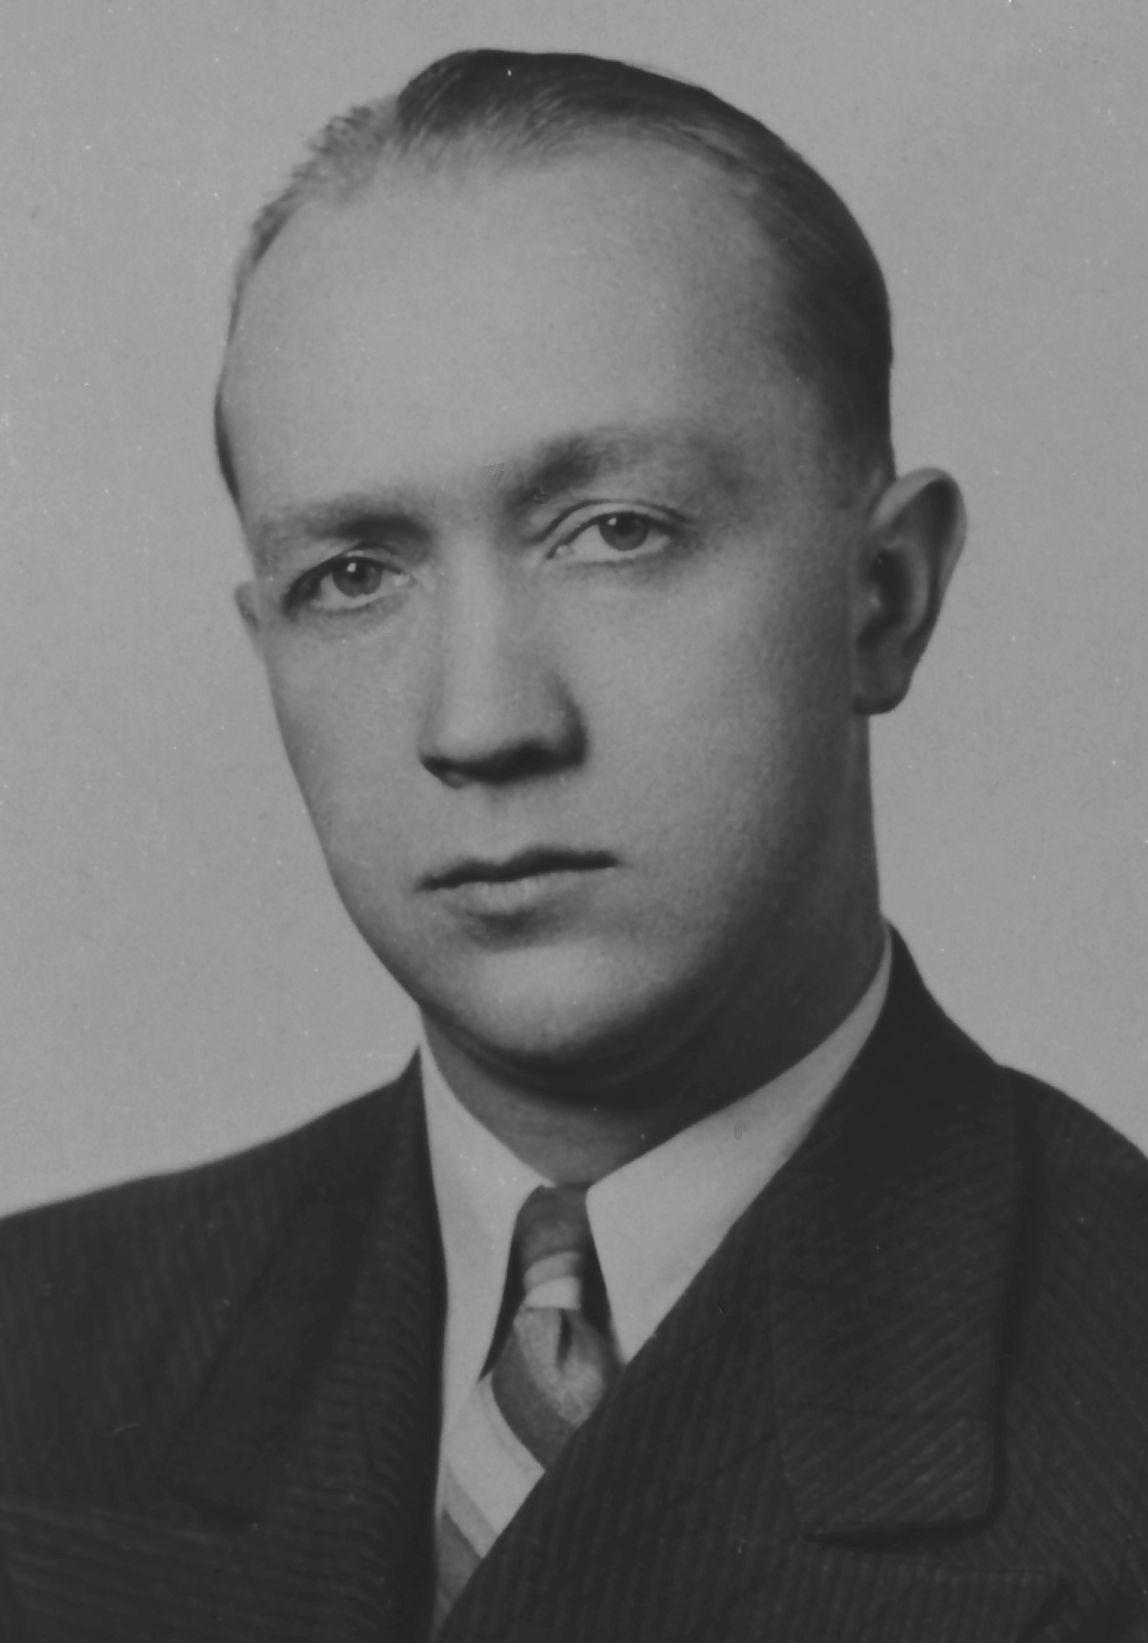 Bagley, Louis Neff